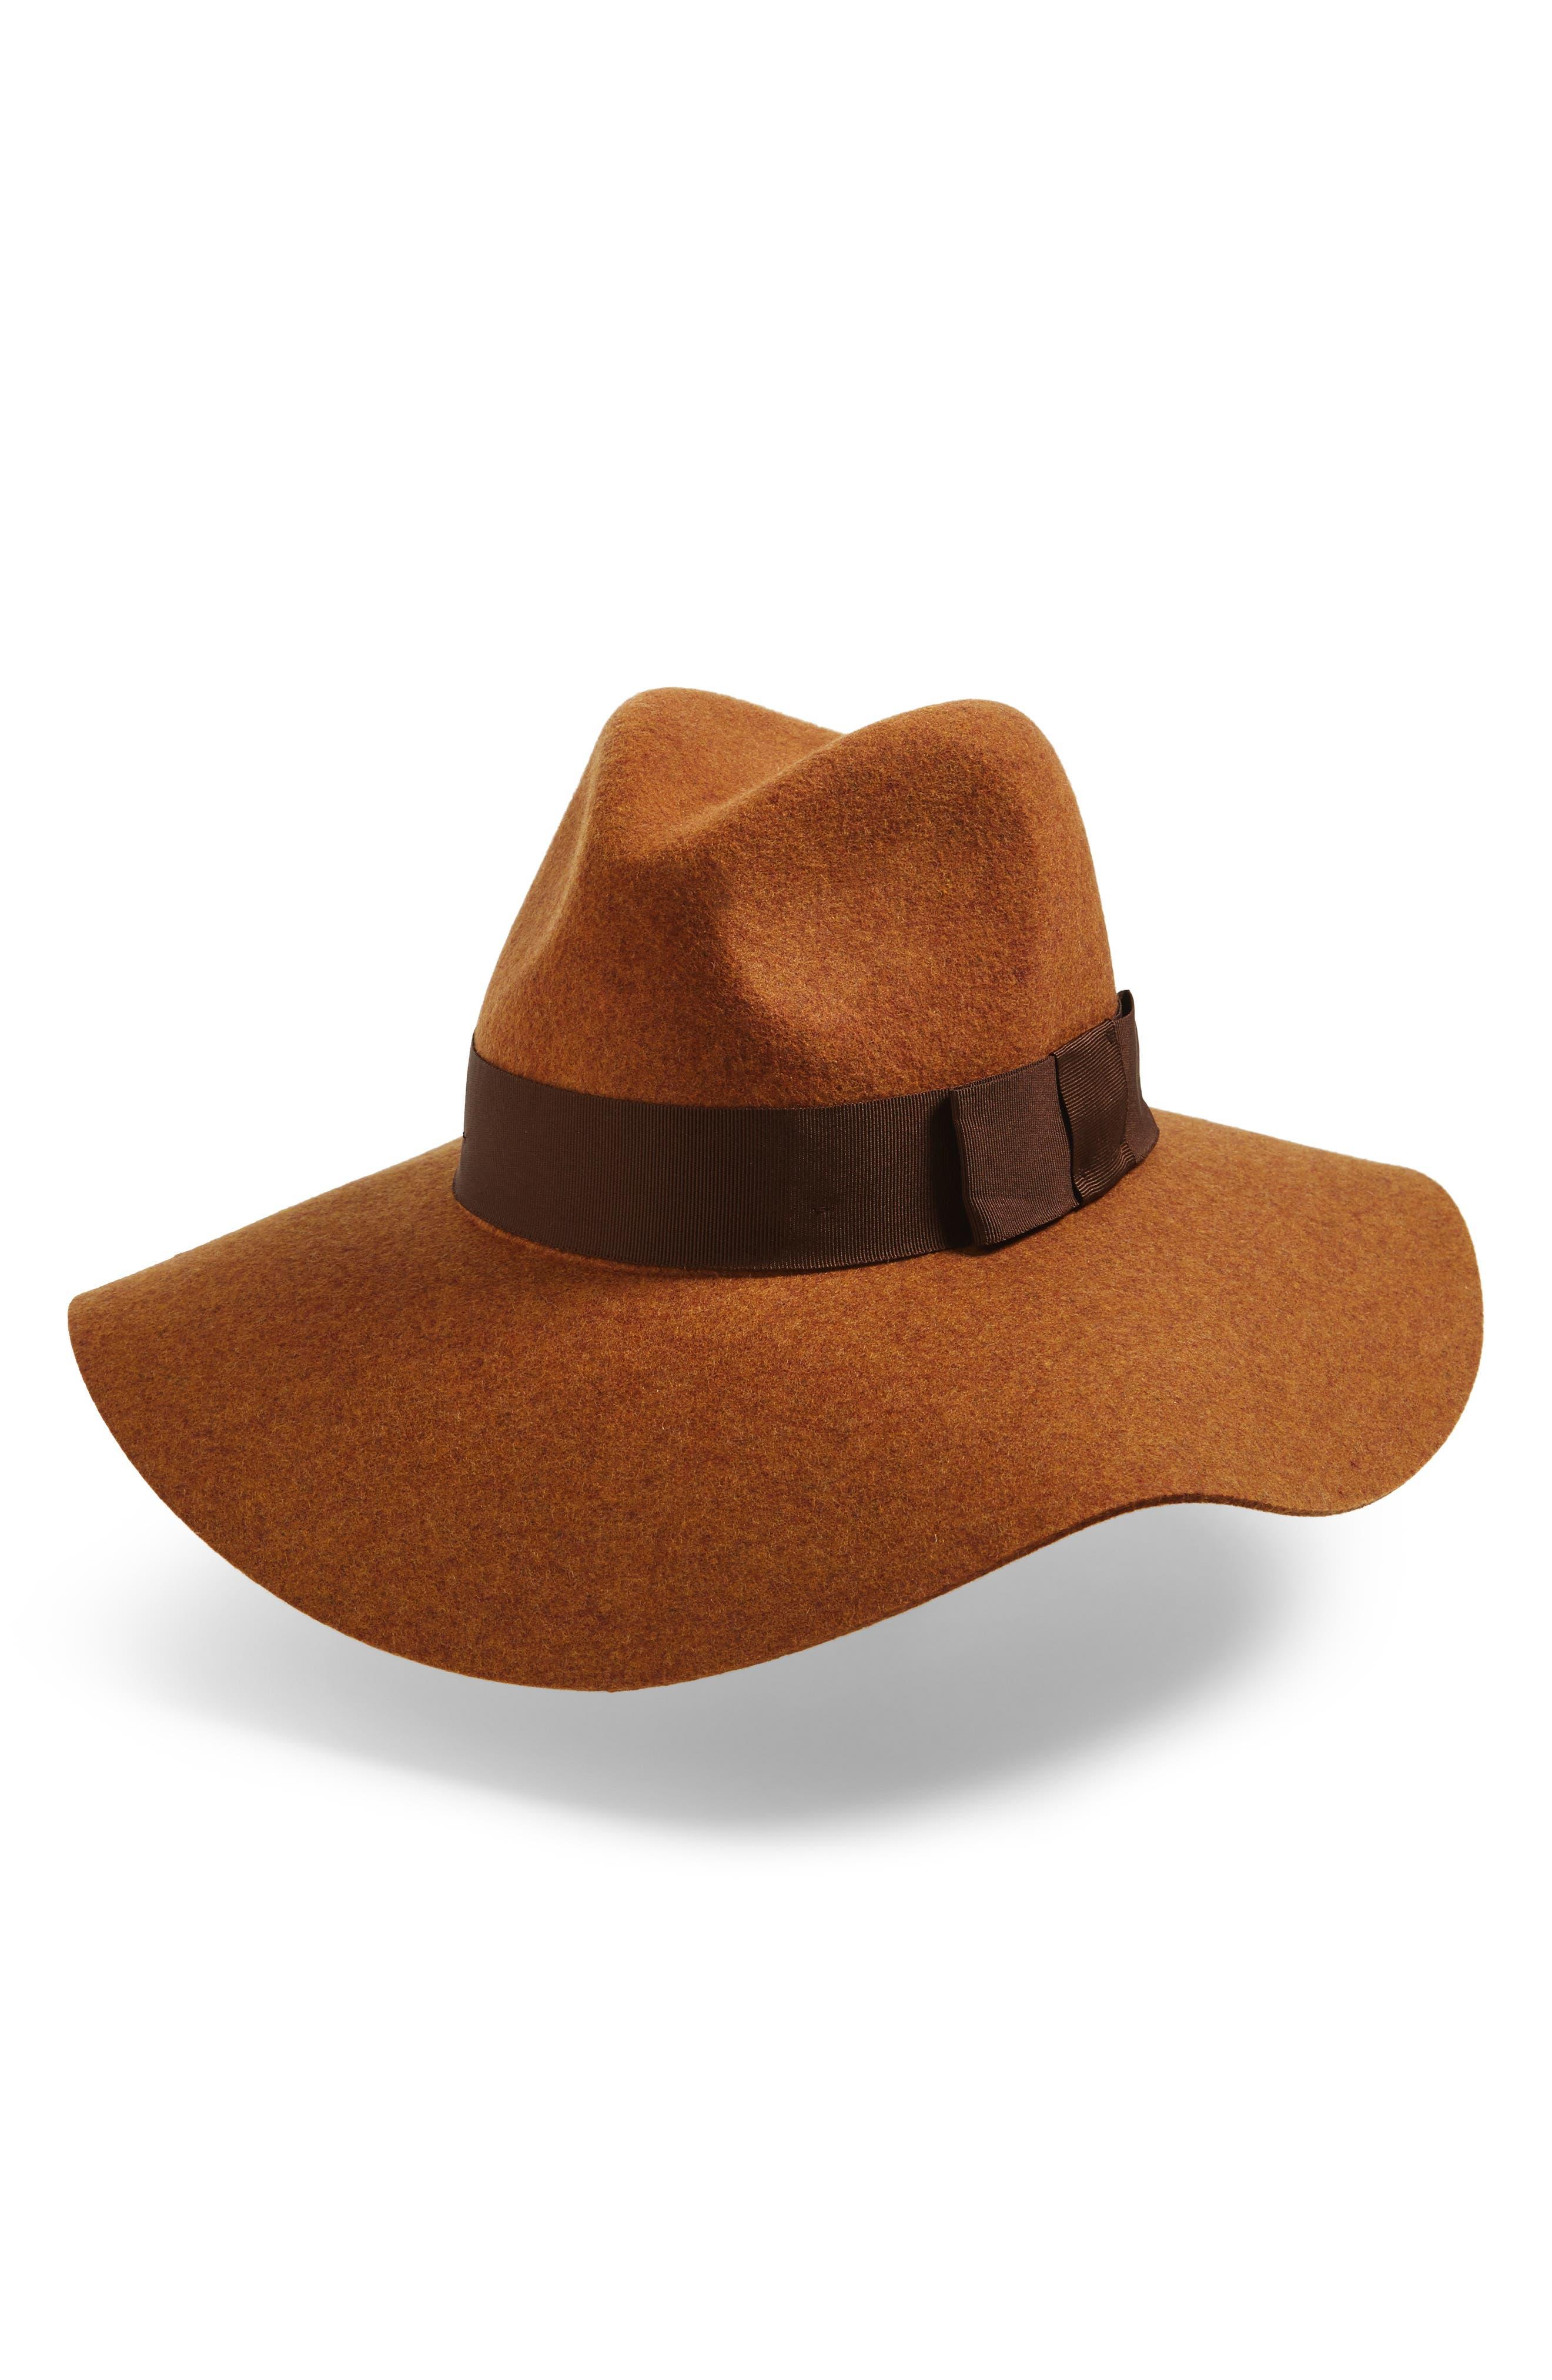 39a01ba0e37 Brixton Piper Floppy Wool Felt Hat - Brown In Heather Coffee ...